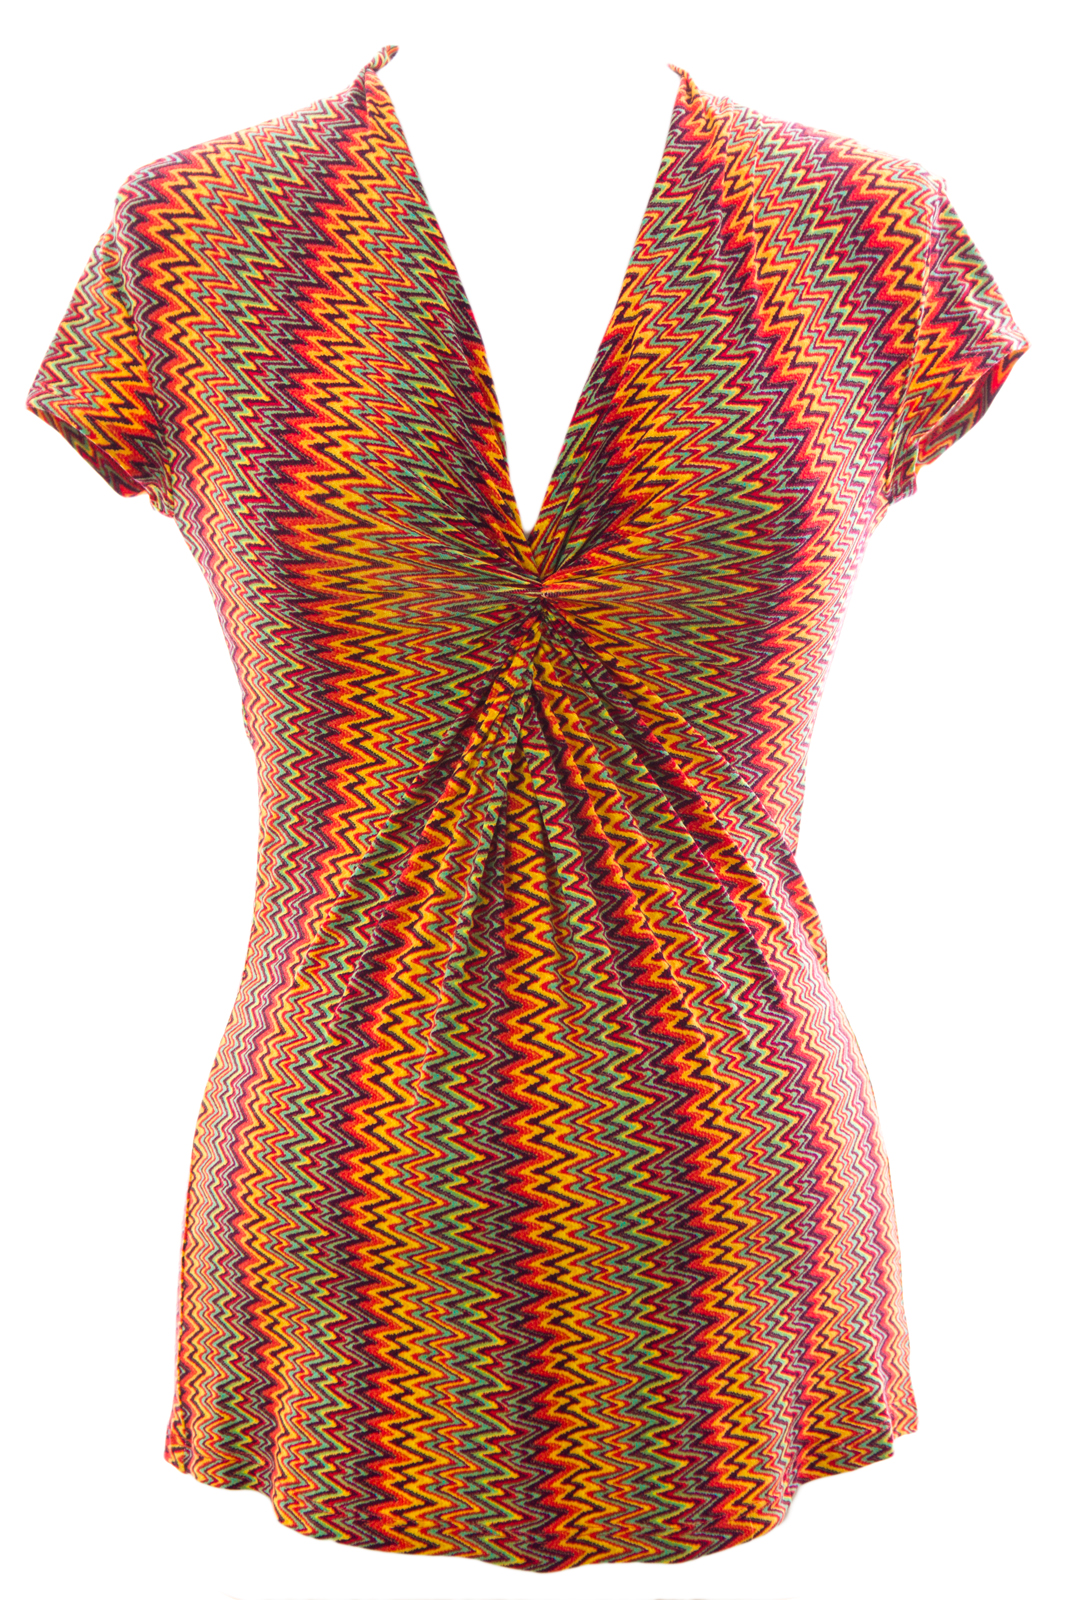 Olian Women's Zig Zag Print Twist Detail Maternity Top Small Multicolor